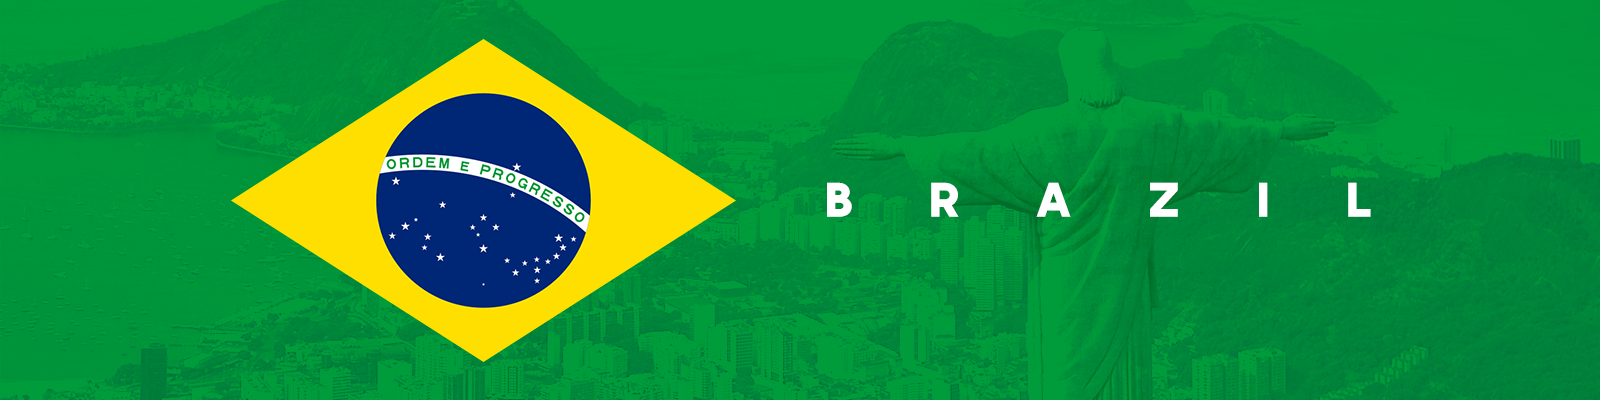 Brazil app developers